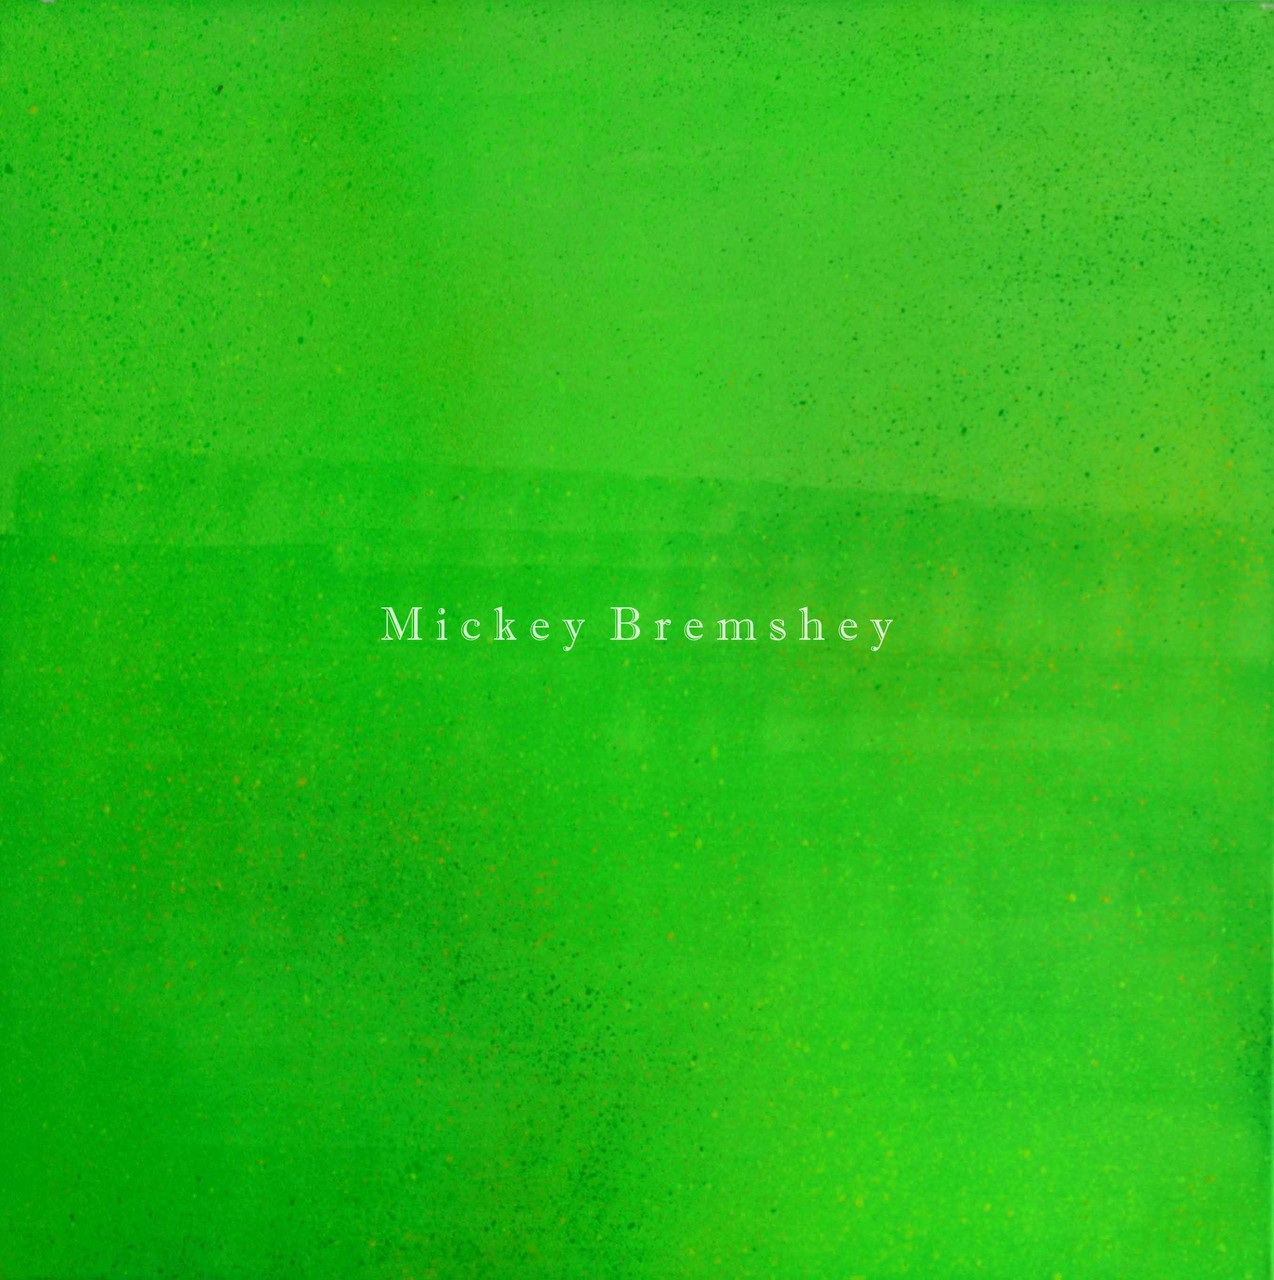 bremshey.illuminare.081275-006-t